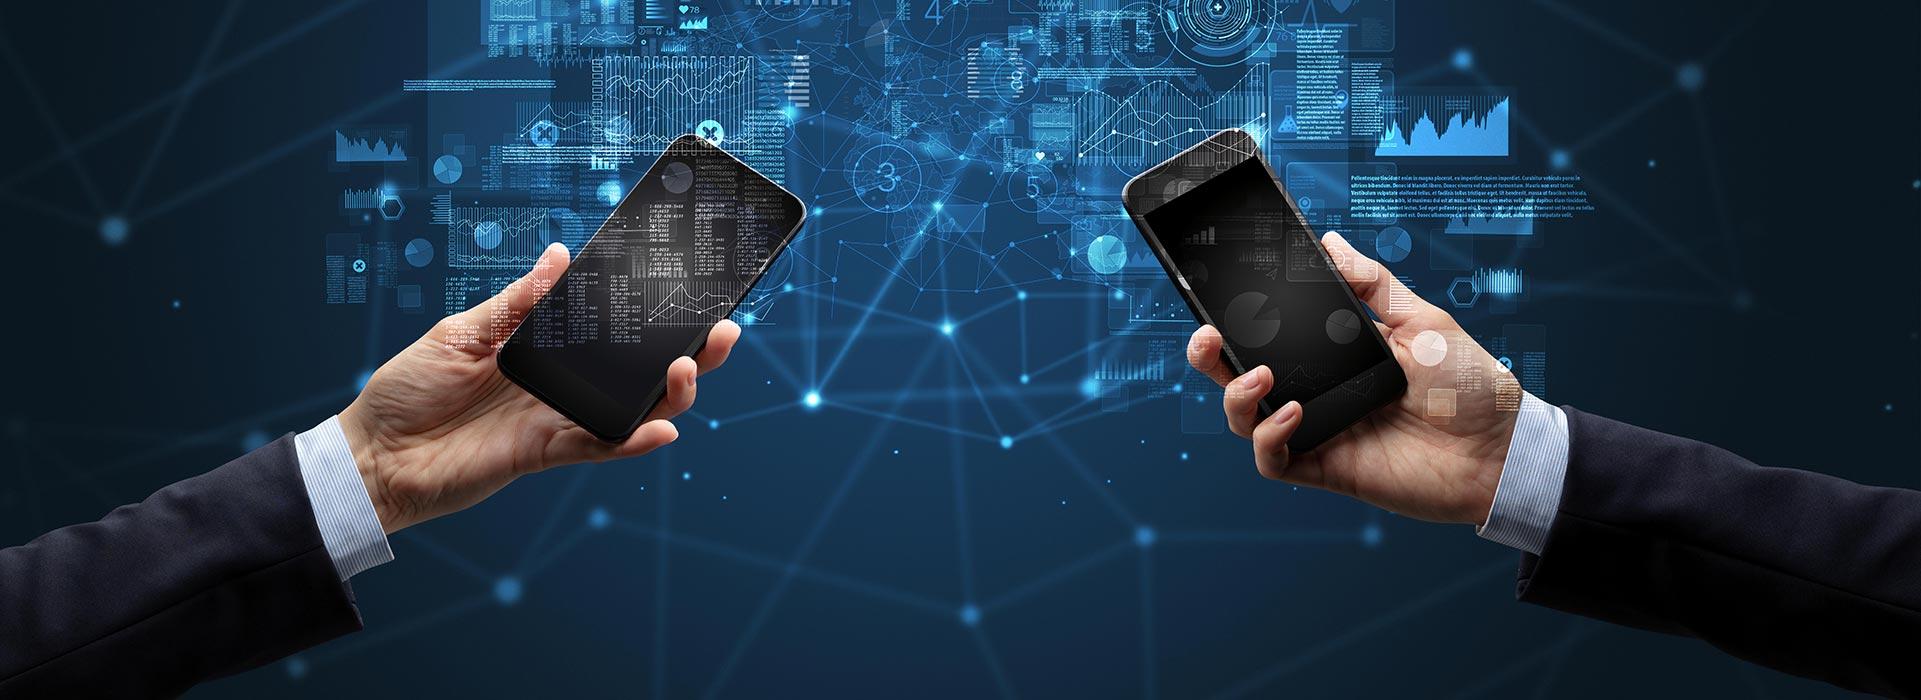 Sincronizzazione Dispositivi Mobili | MESSAGECLOUD